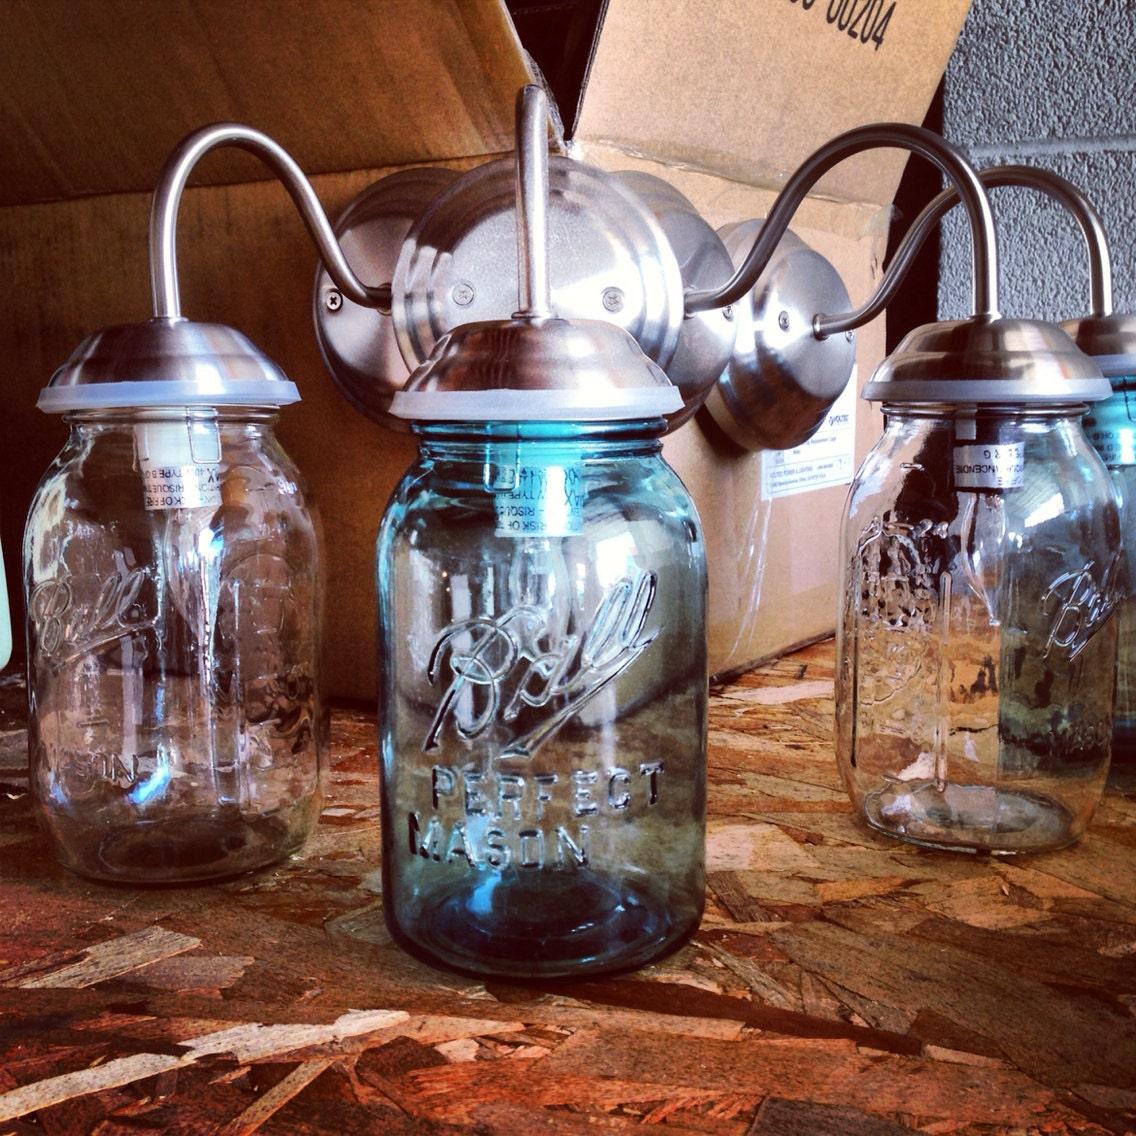 Mason Jar Wall Sconce Etsy : Mason Jar Wall Sconce Mason jar light by VanVintageDesign on Etsy